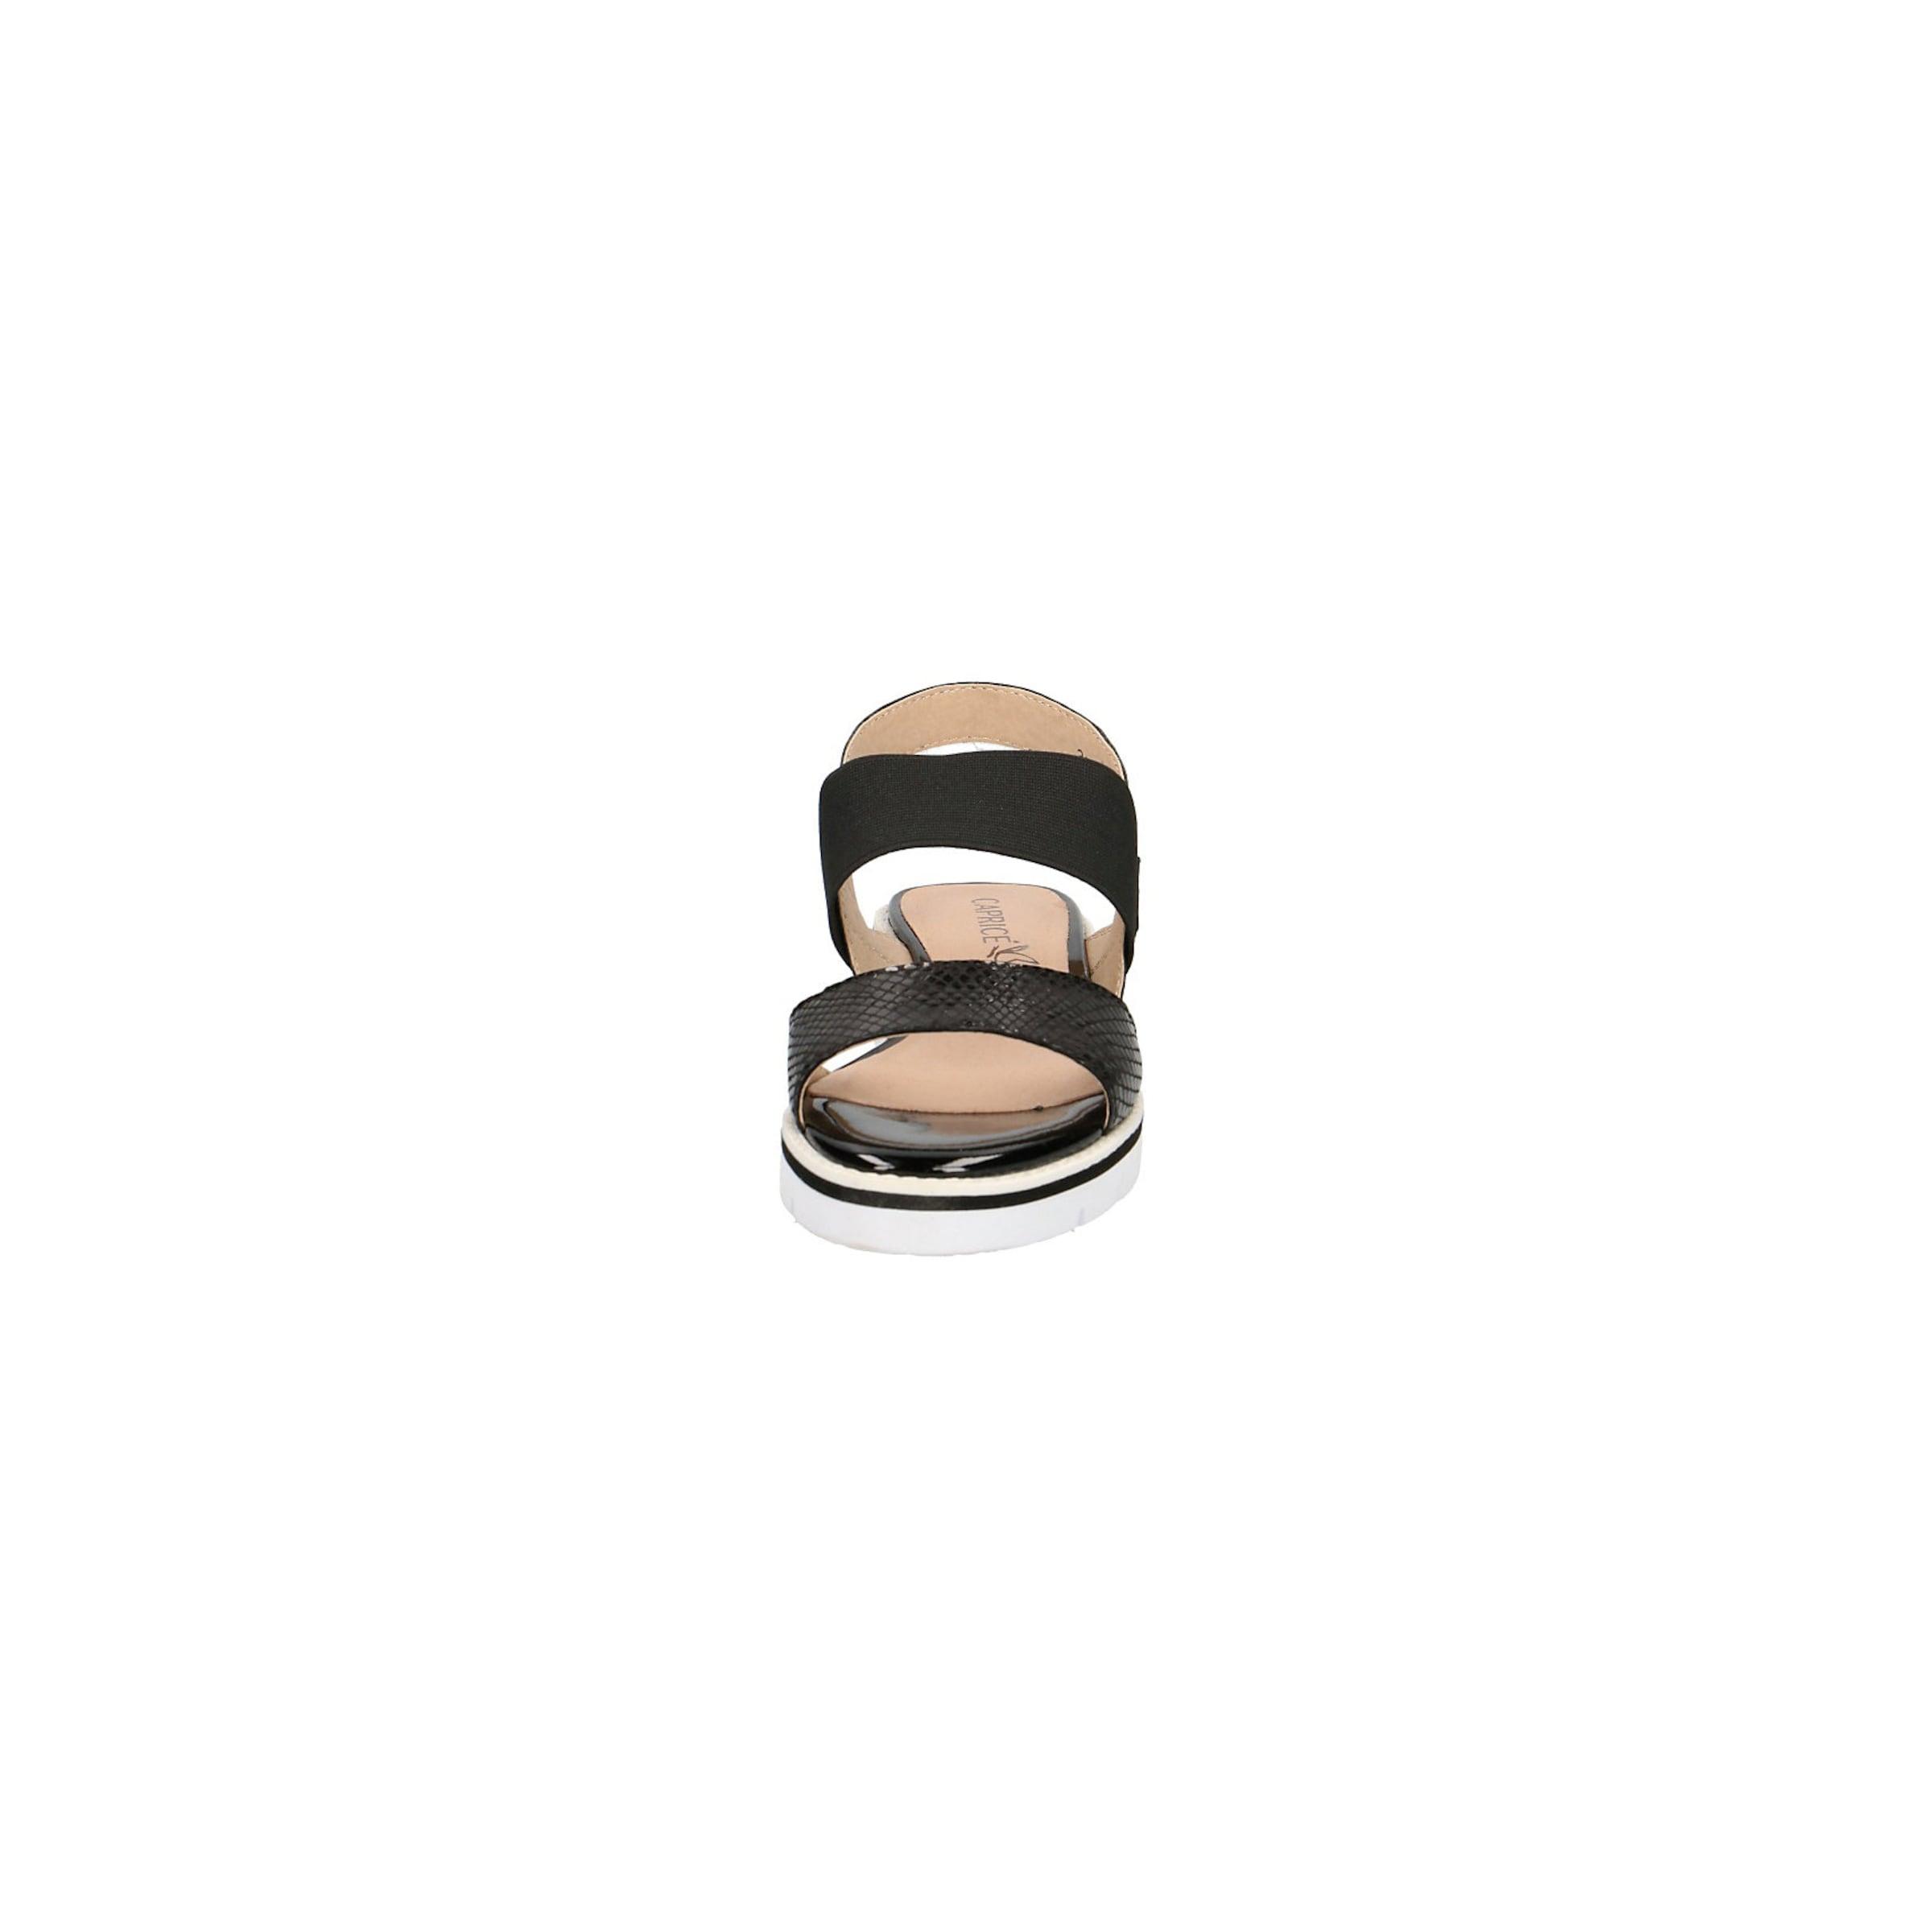 CAPRICE Sandalen Sandalen Sandalen Leder, Textil Bequem, gut aussehend 7ce10f